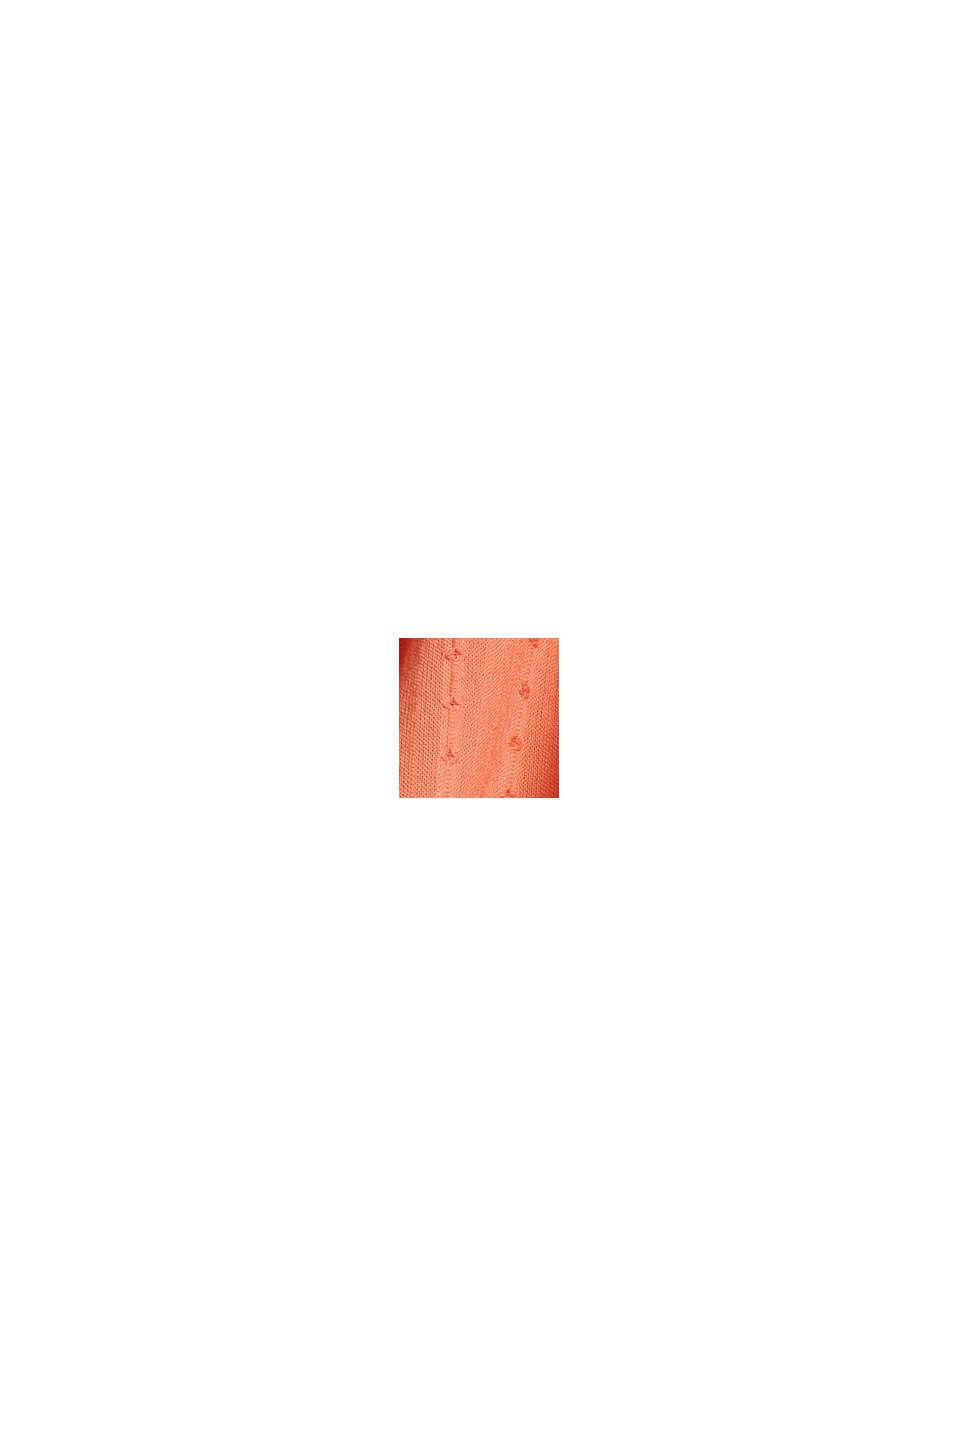 Blouse met geweven structuur, 100% katoen, BLUSH, swatch